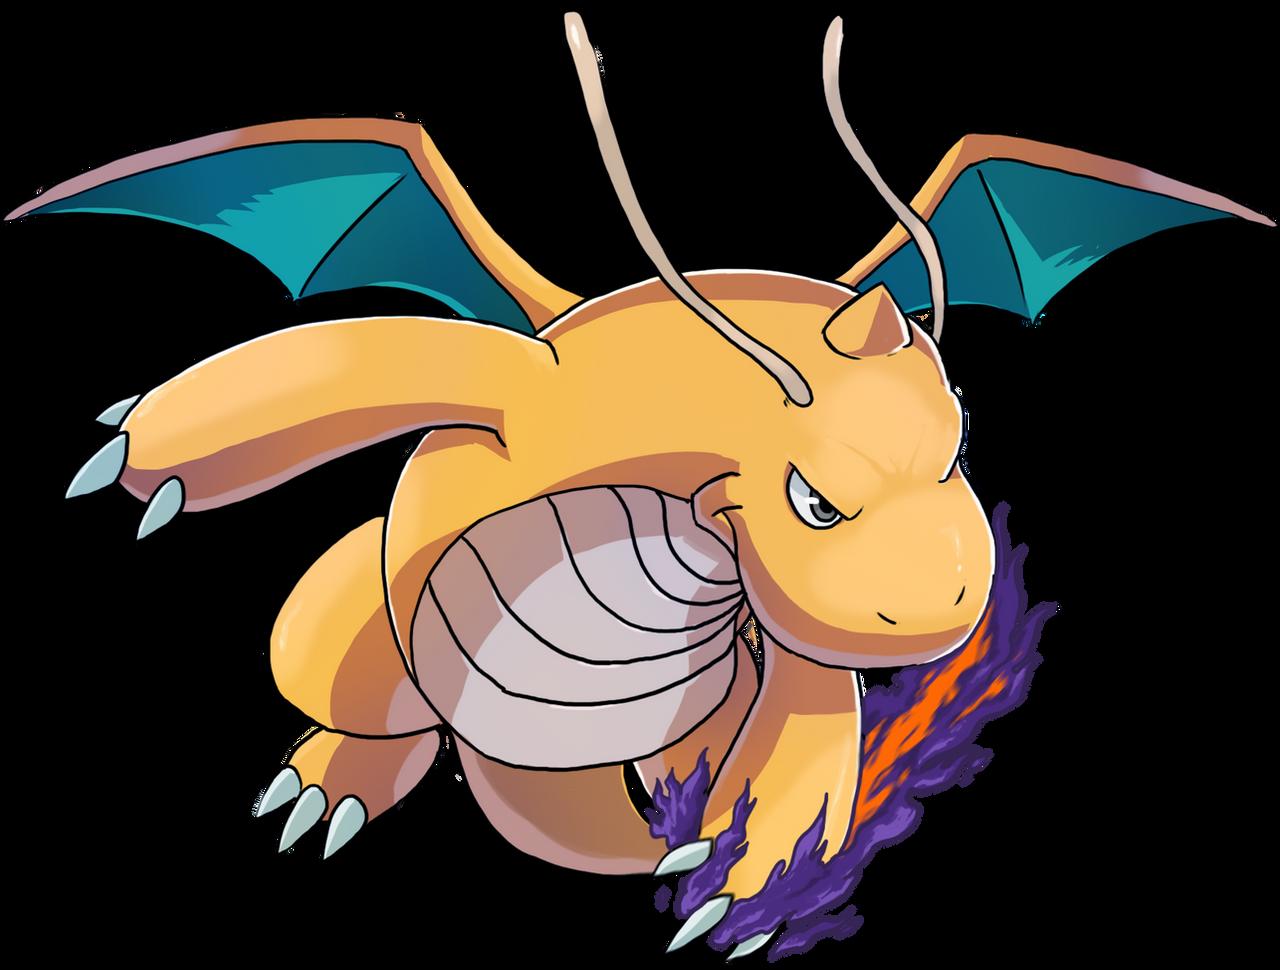 Hilo General - Pokémon GO Dragonite_dragon_claw_by_izzarchron-d7yun57